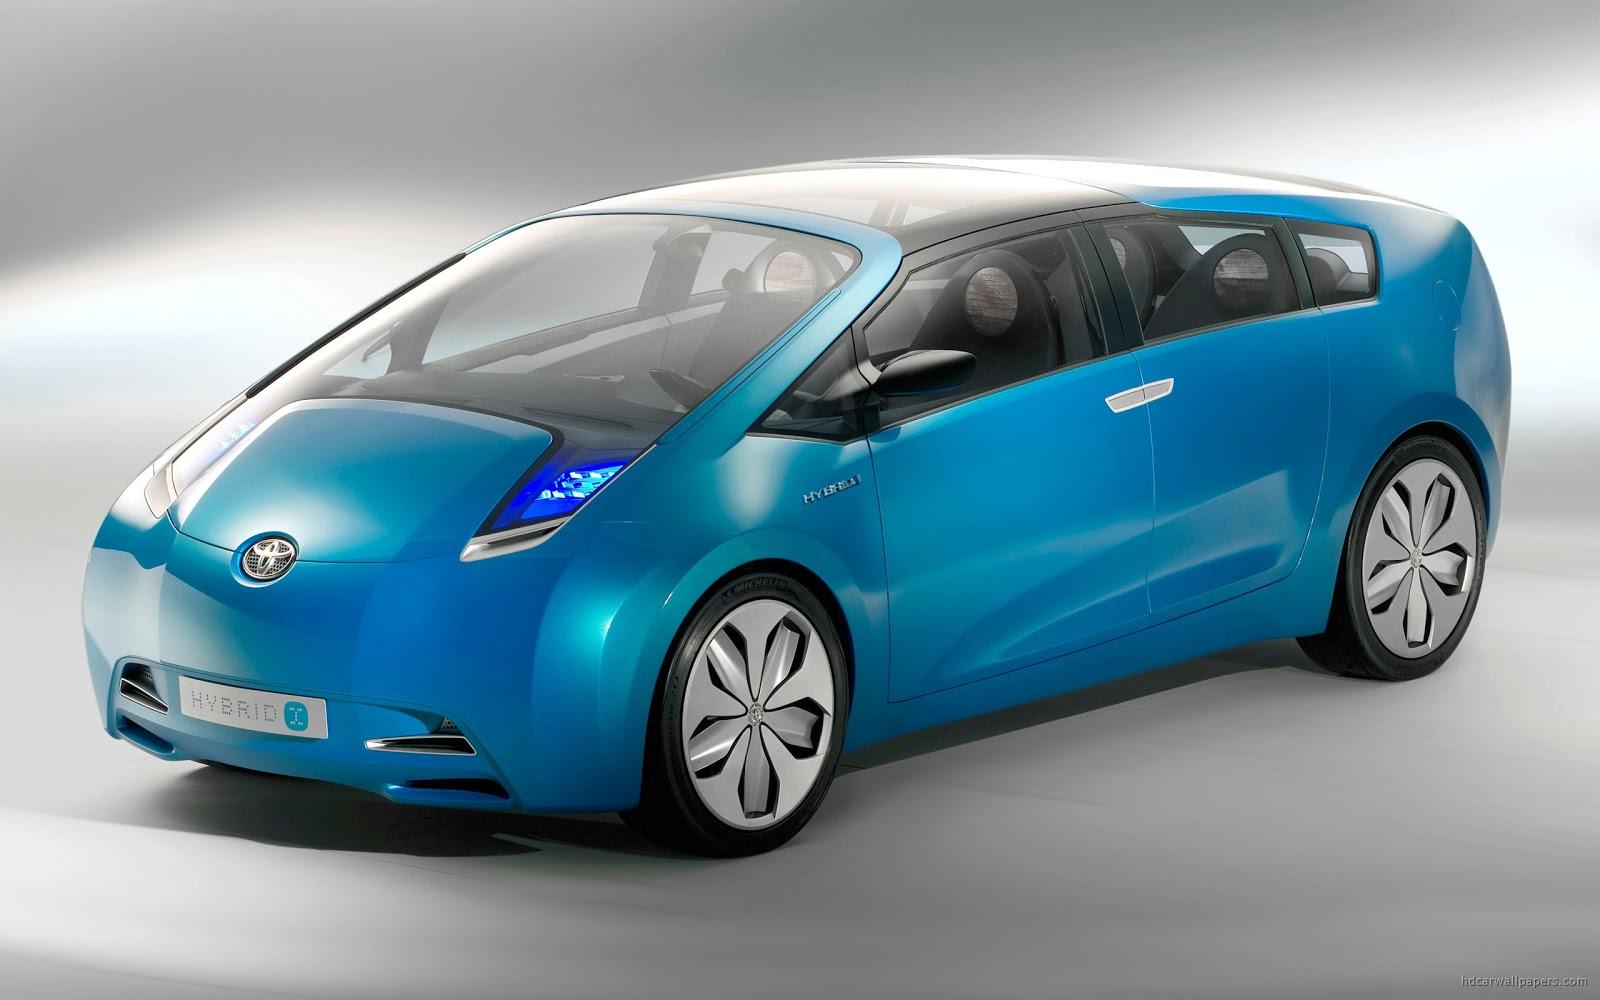 https://2.bp.blogspot.com/-RHkrQeM7g3I/ULdh3jeAq5I/AAAAAAAAAtw/XdHHn5cX4yc/s1600/Download+Toyota+Hybrid+X+Concept+HD+Widescreen+car+wallpaper.jpg